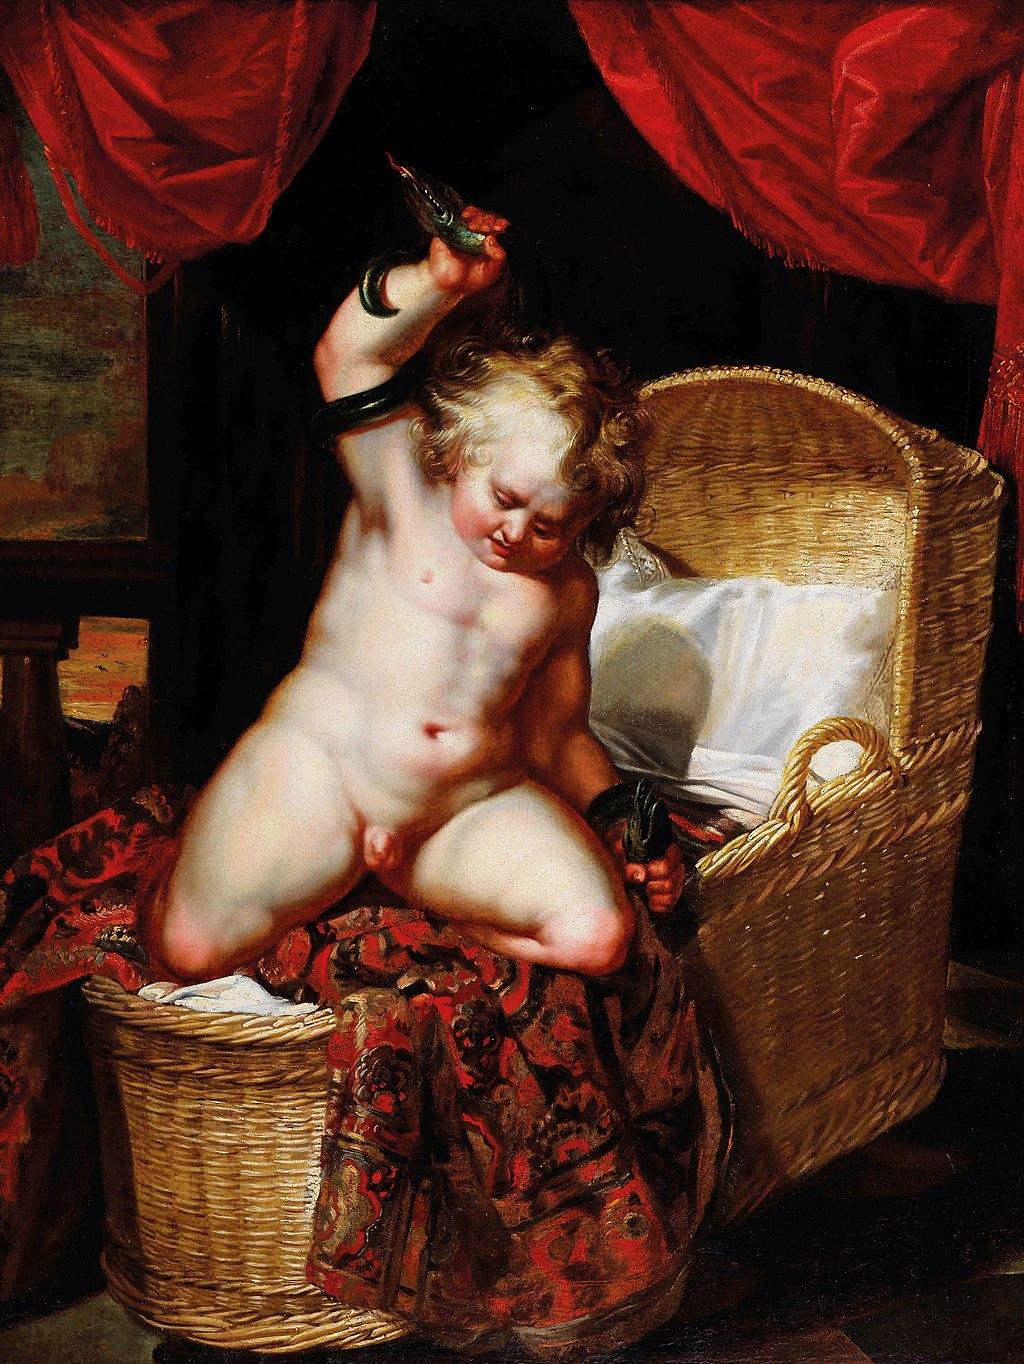 Baby Herakles killing a snake